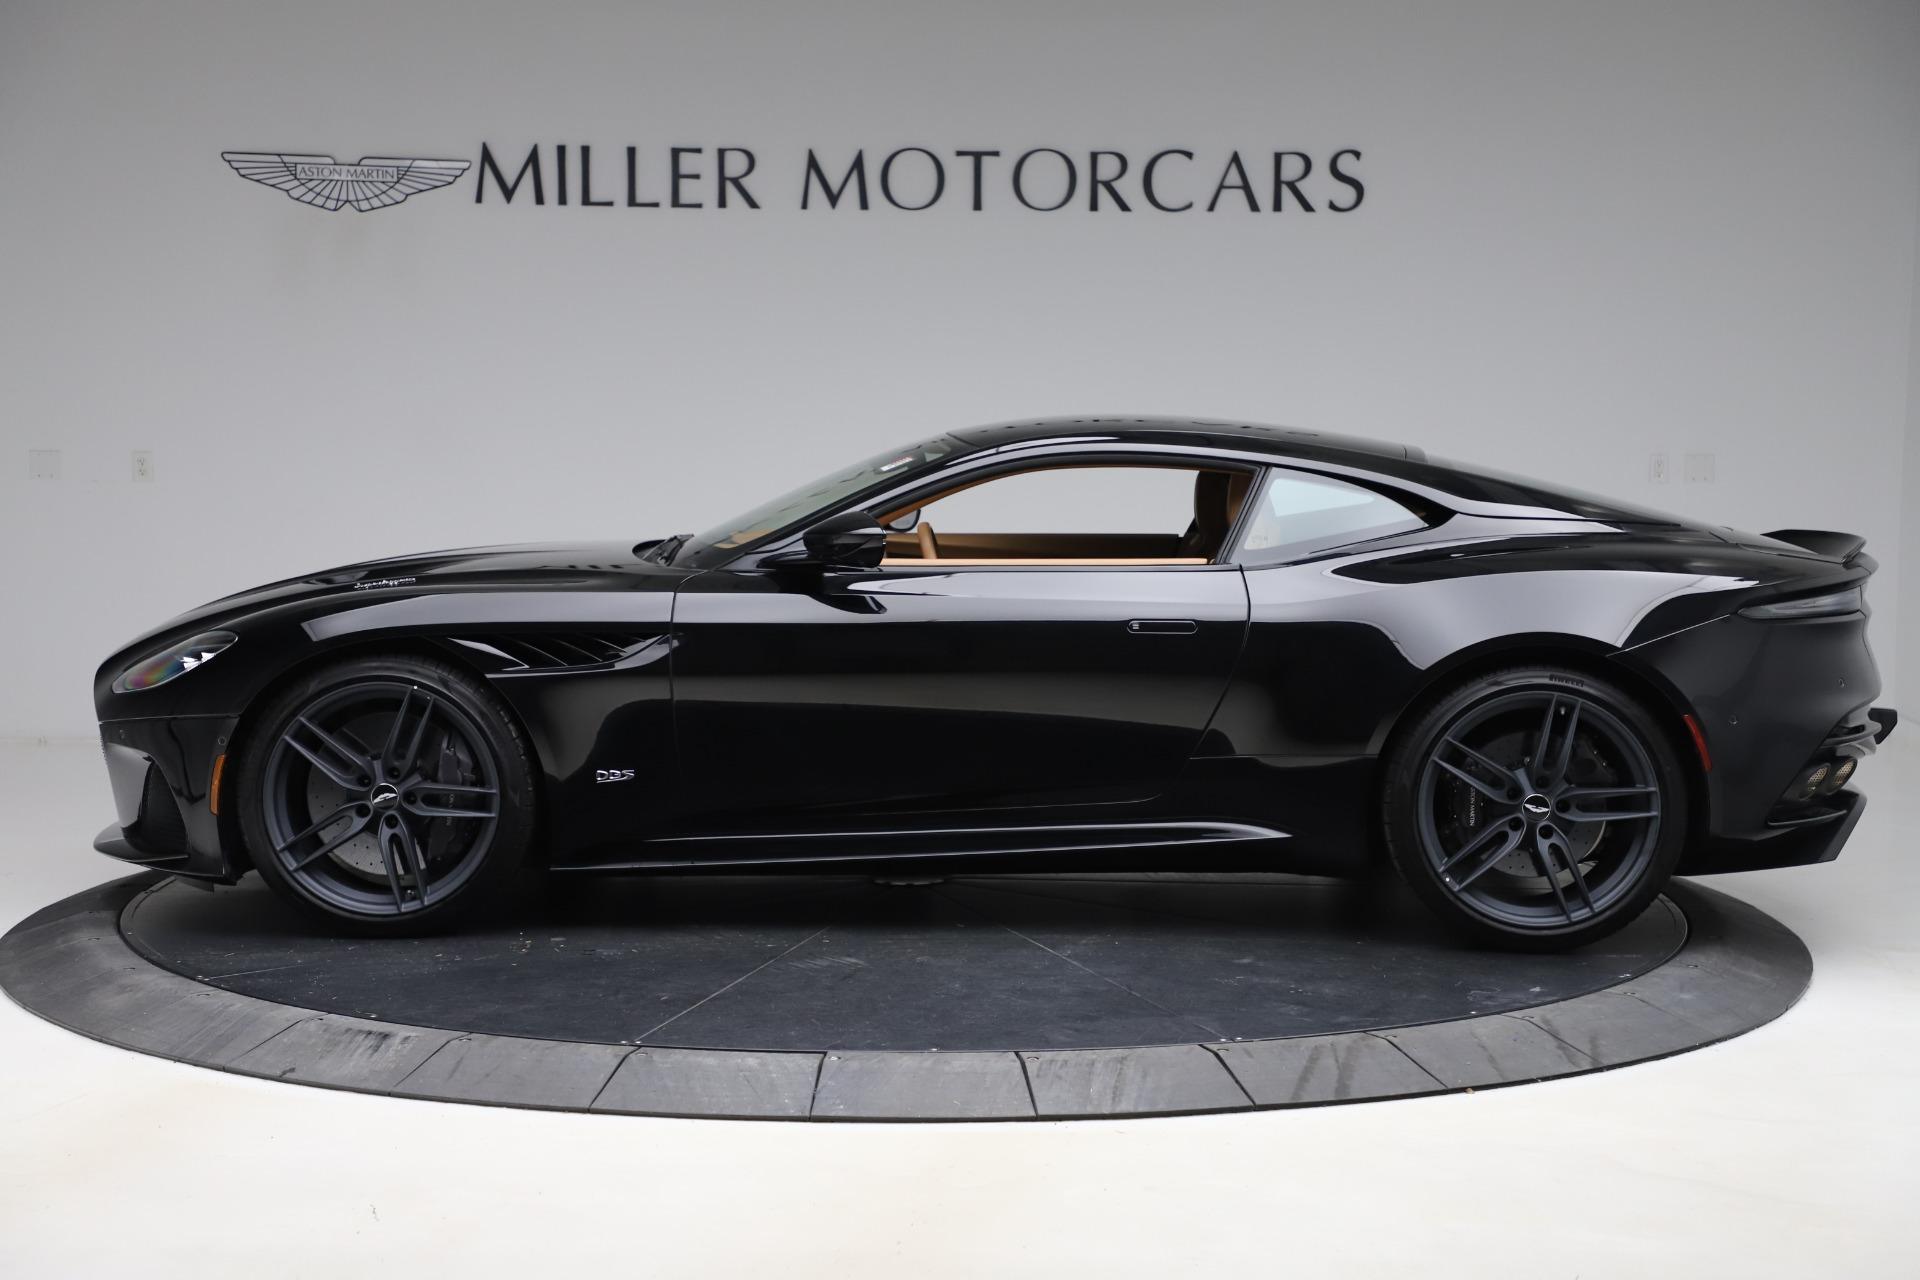 New 2019 Aston Martin Dbs Superleggera Coupe For Sale Special Pricing Mclaren Greenwich Stock A1431